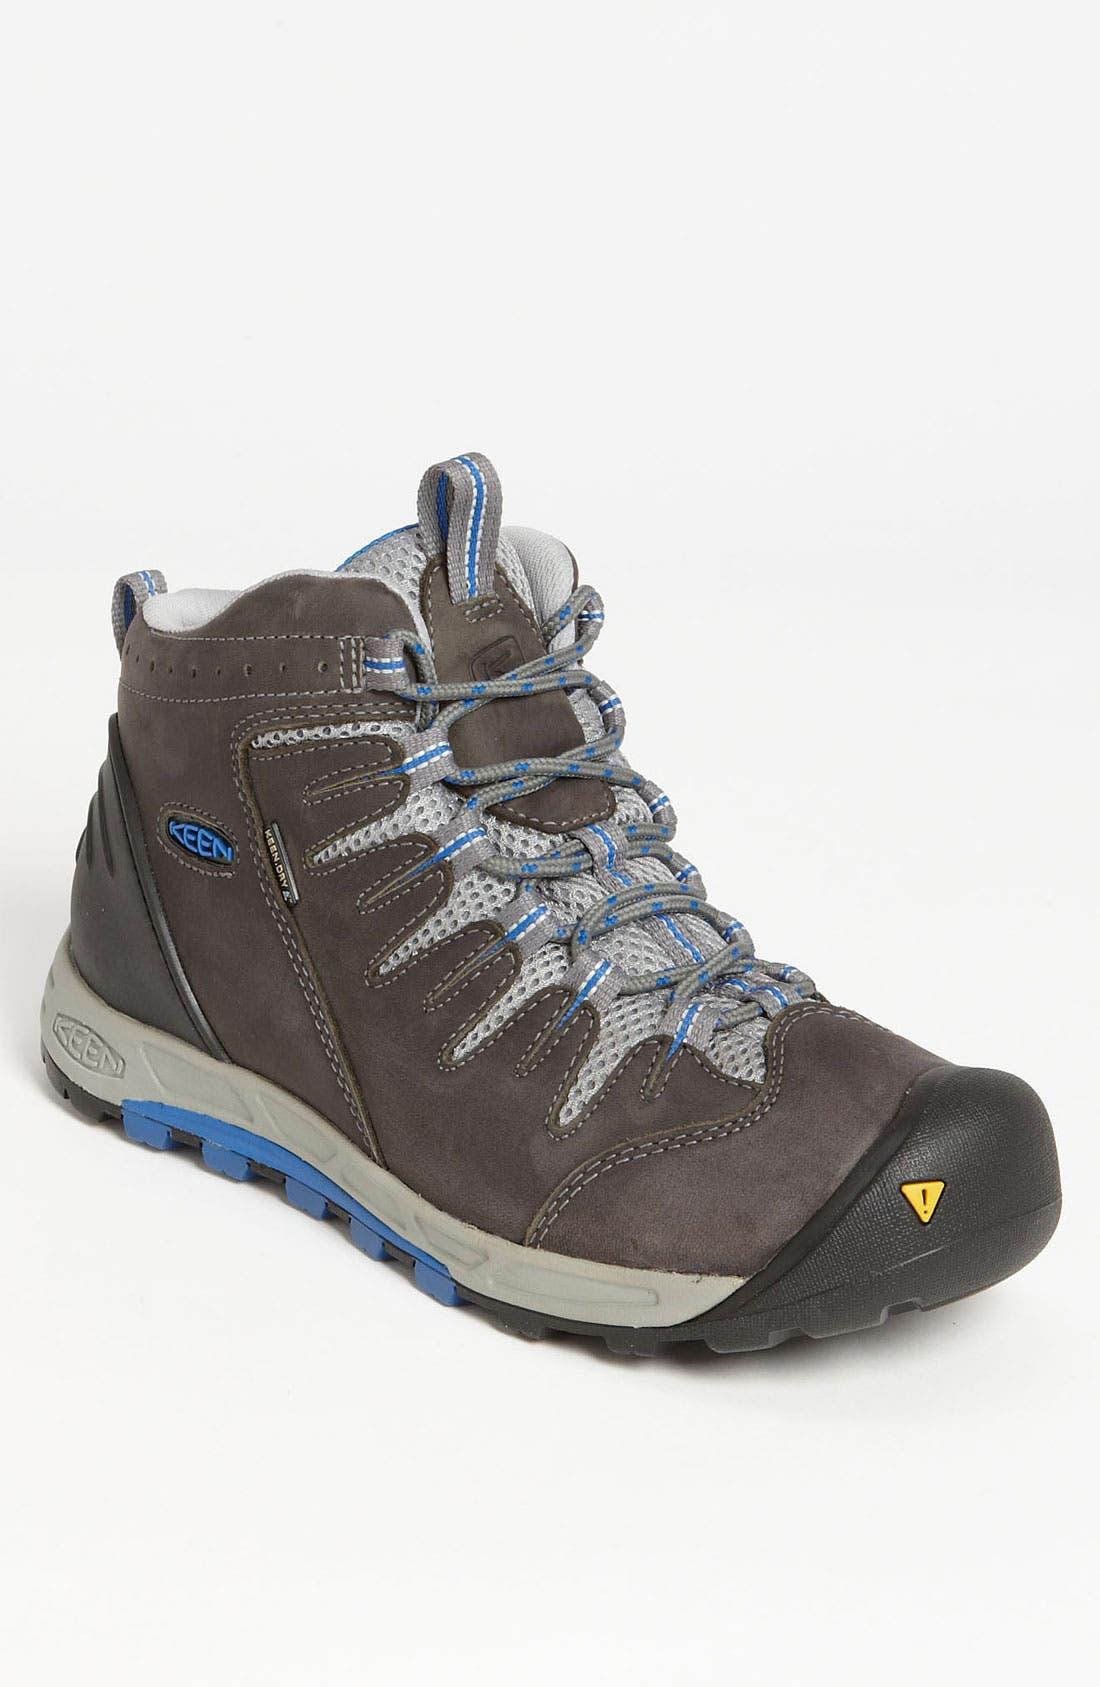 Alternate Image 1 Selected - Keen 'Bryce' Hiking Boot (Men)